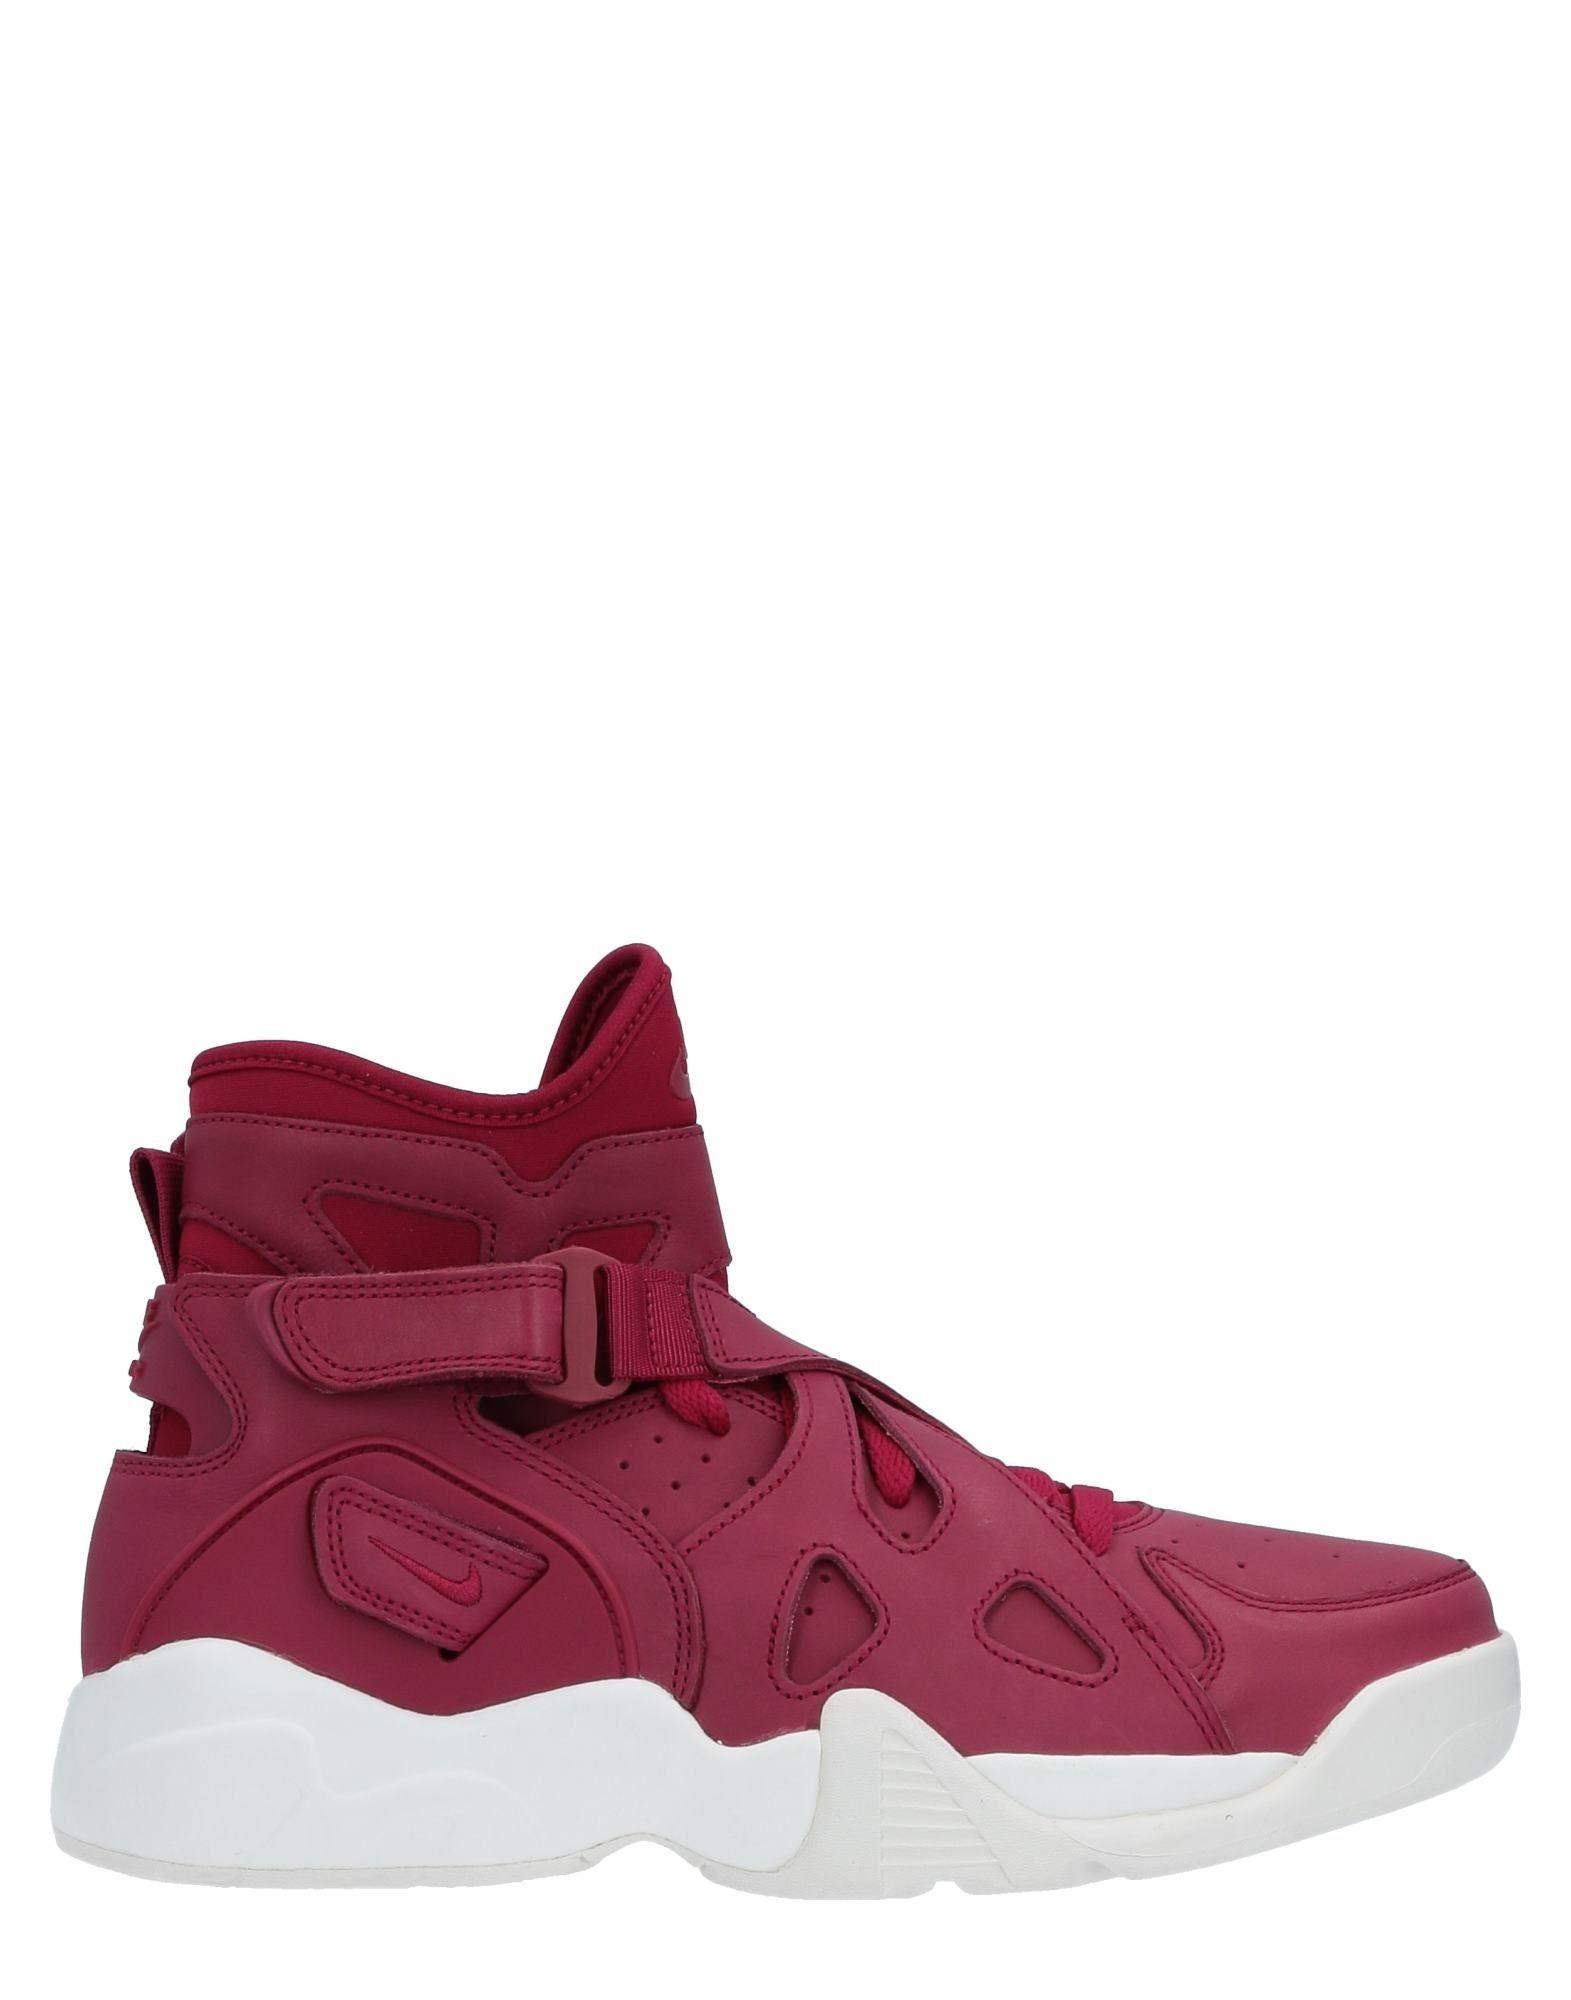 A buon mercato Sneakers Nike Uomo - 11246860IA